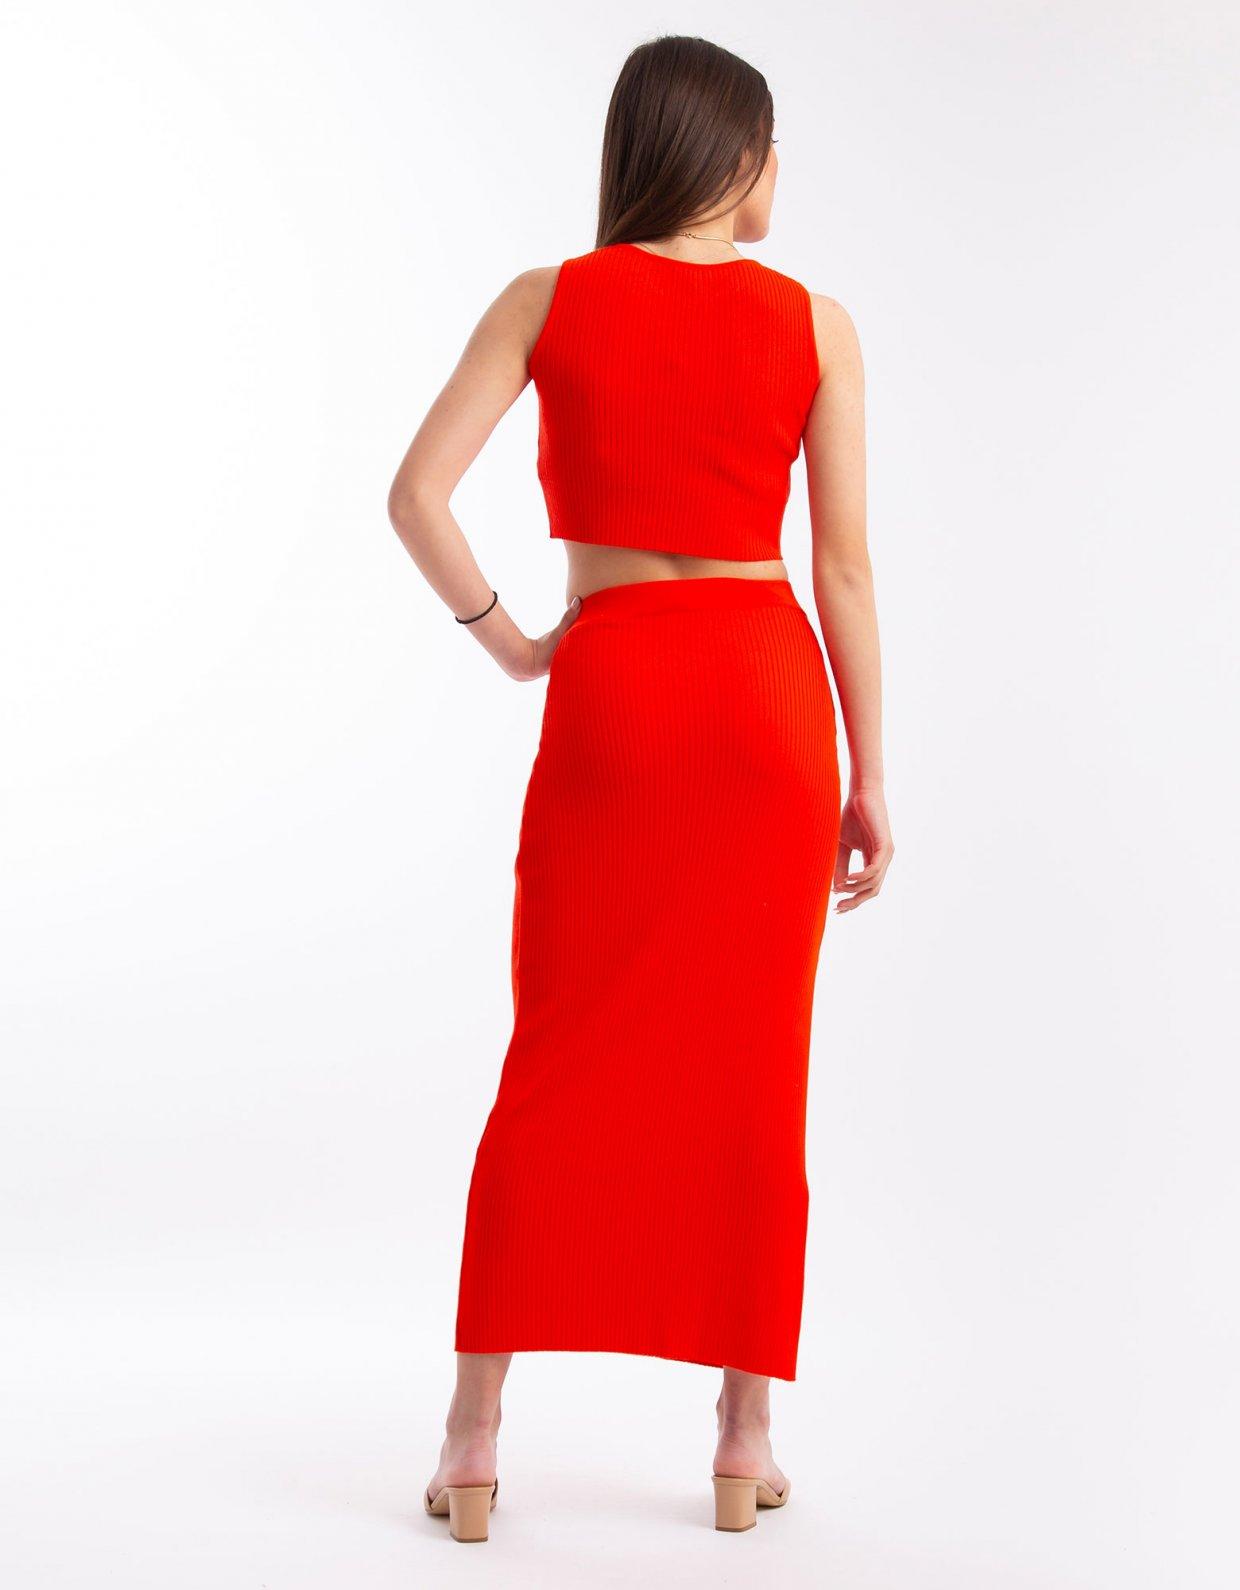 Combos Knitwear Combos S24 – Coral set